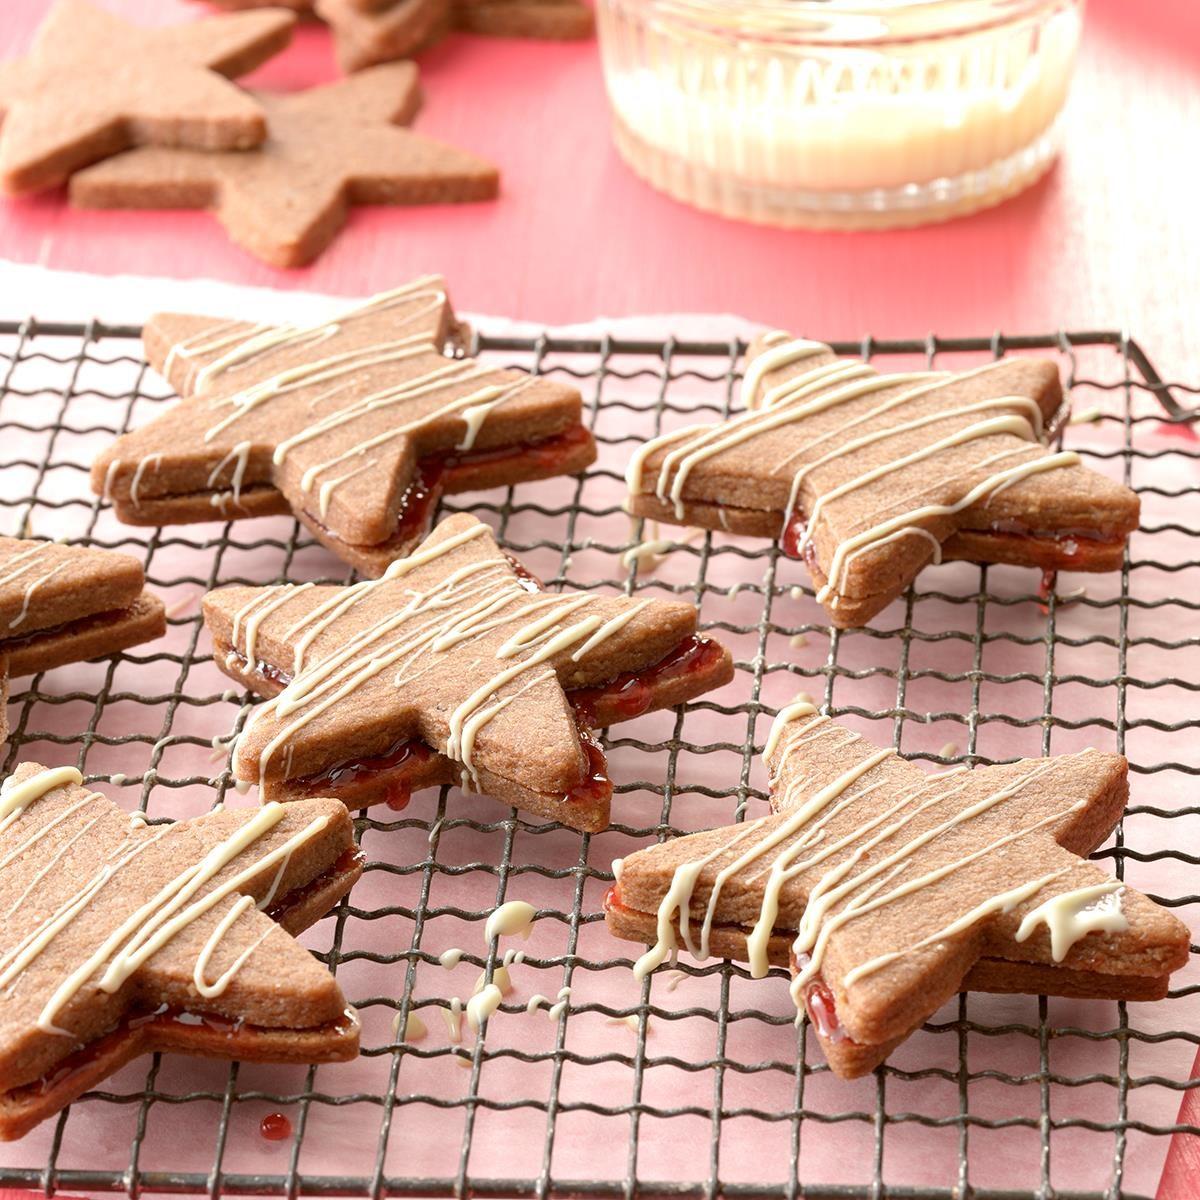 Grandma's Last-Minute Christmas Cookies